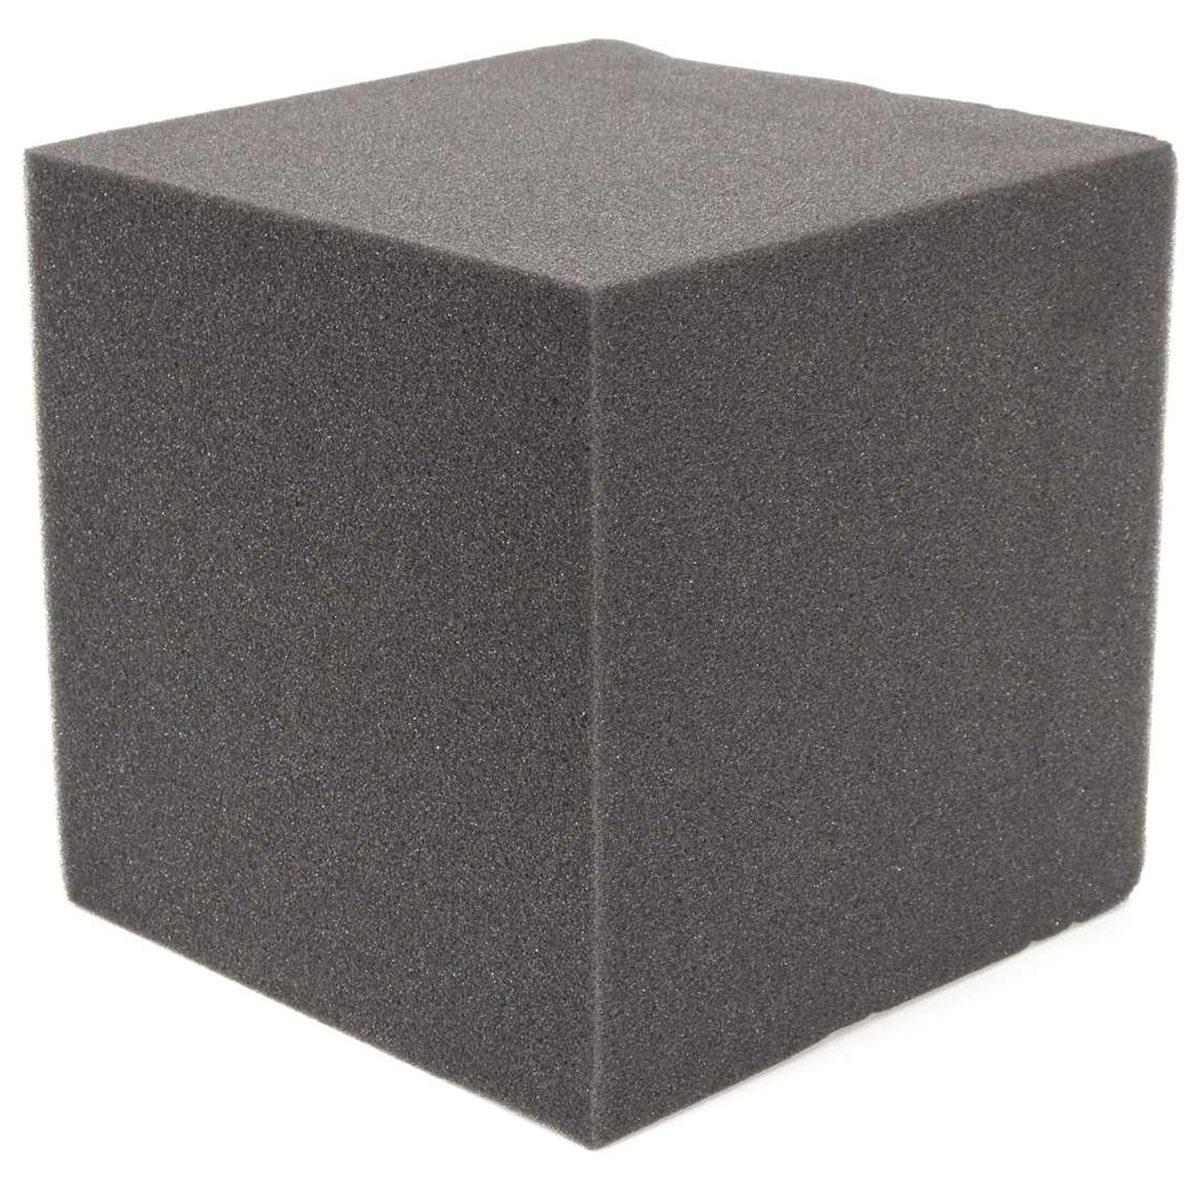 20x20x20cm 2 uds aislamiento acústico absorción de algodón sala de música acústica Panel de pared espuma acústica de algodón de poliuretano